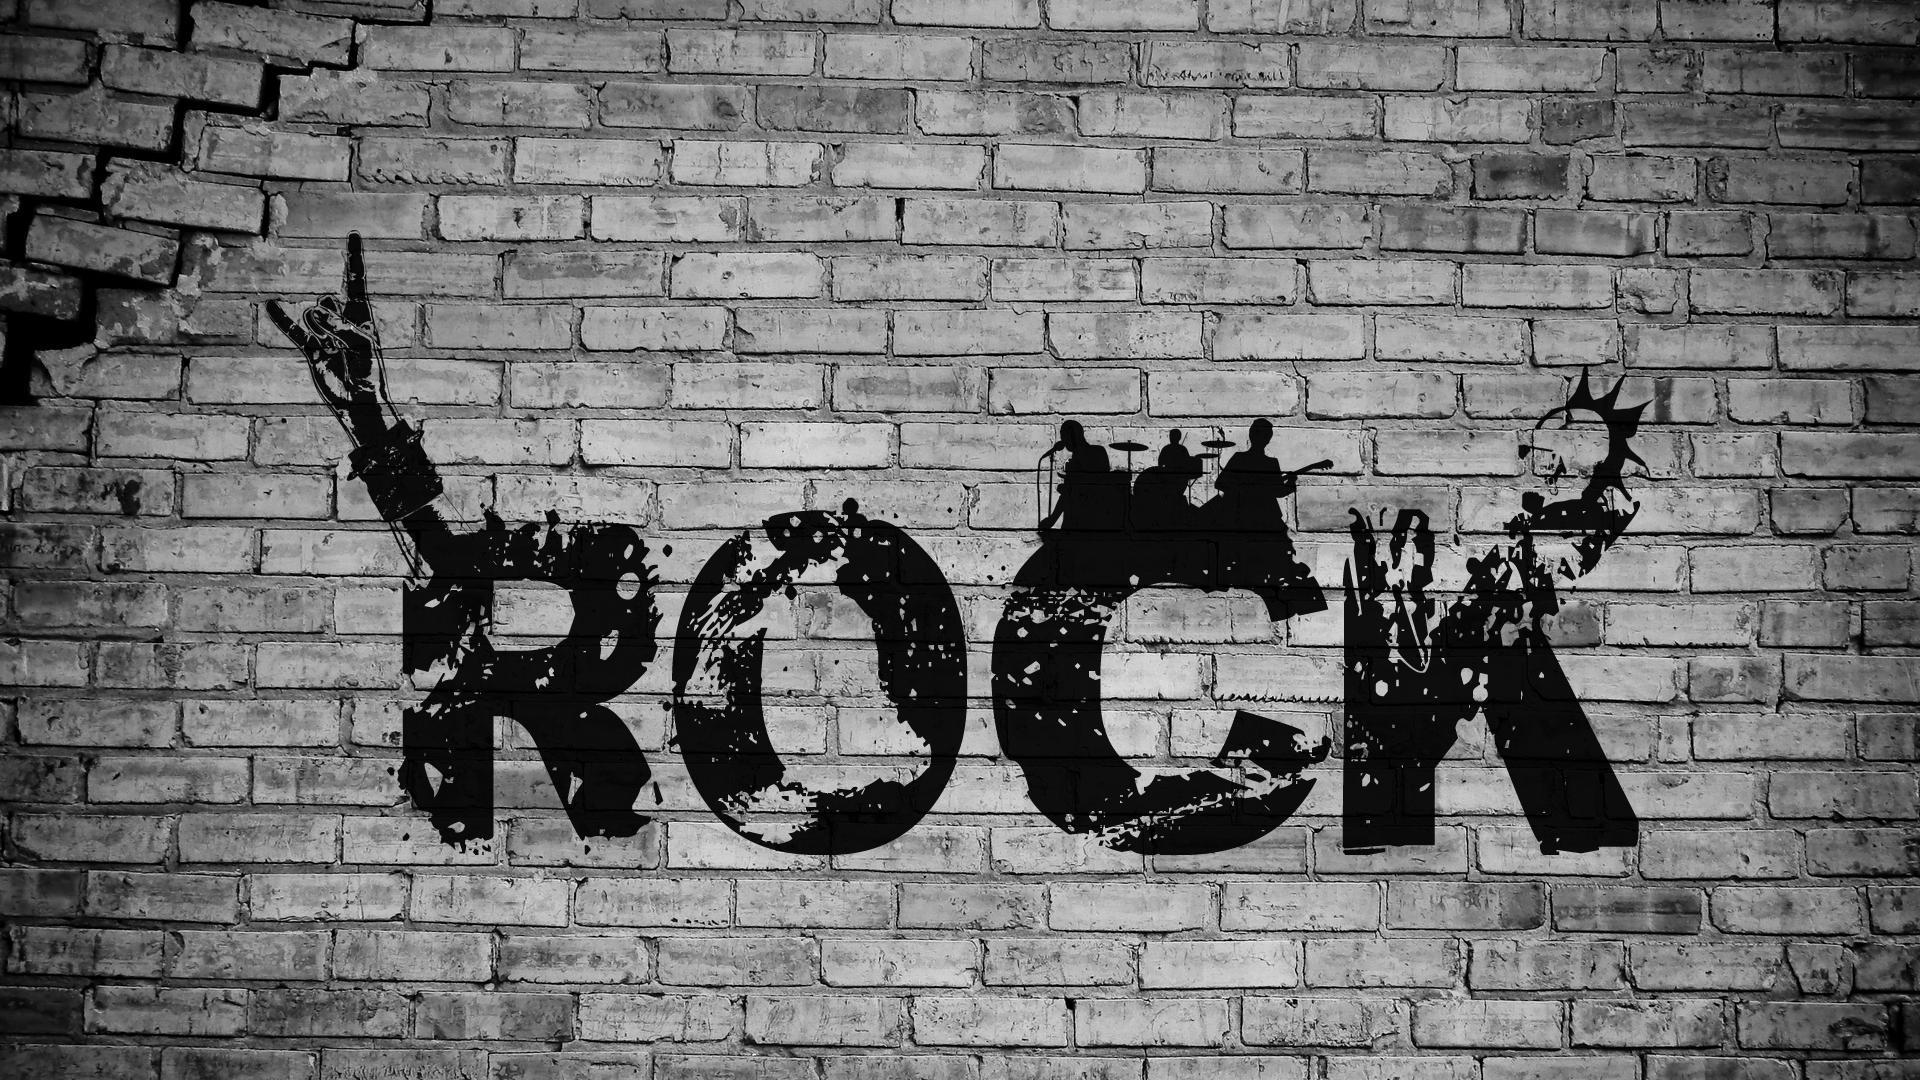 Punk Rock Wallpapers Free Download | PixelsTalk.Net